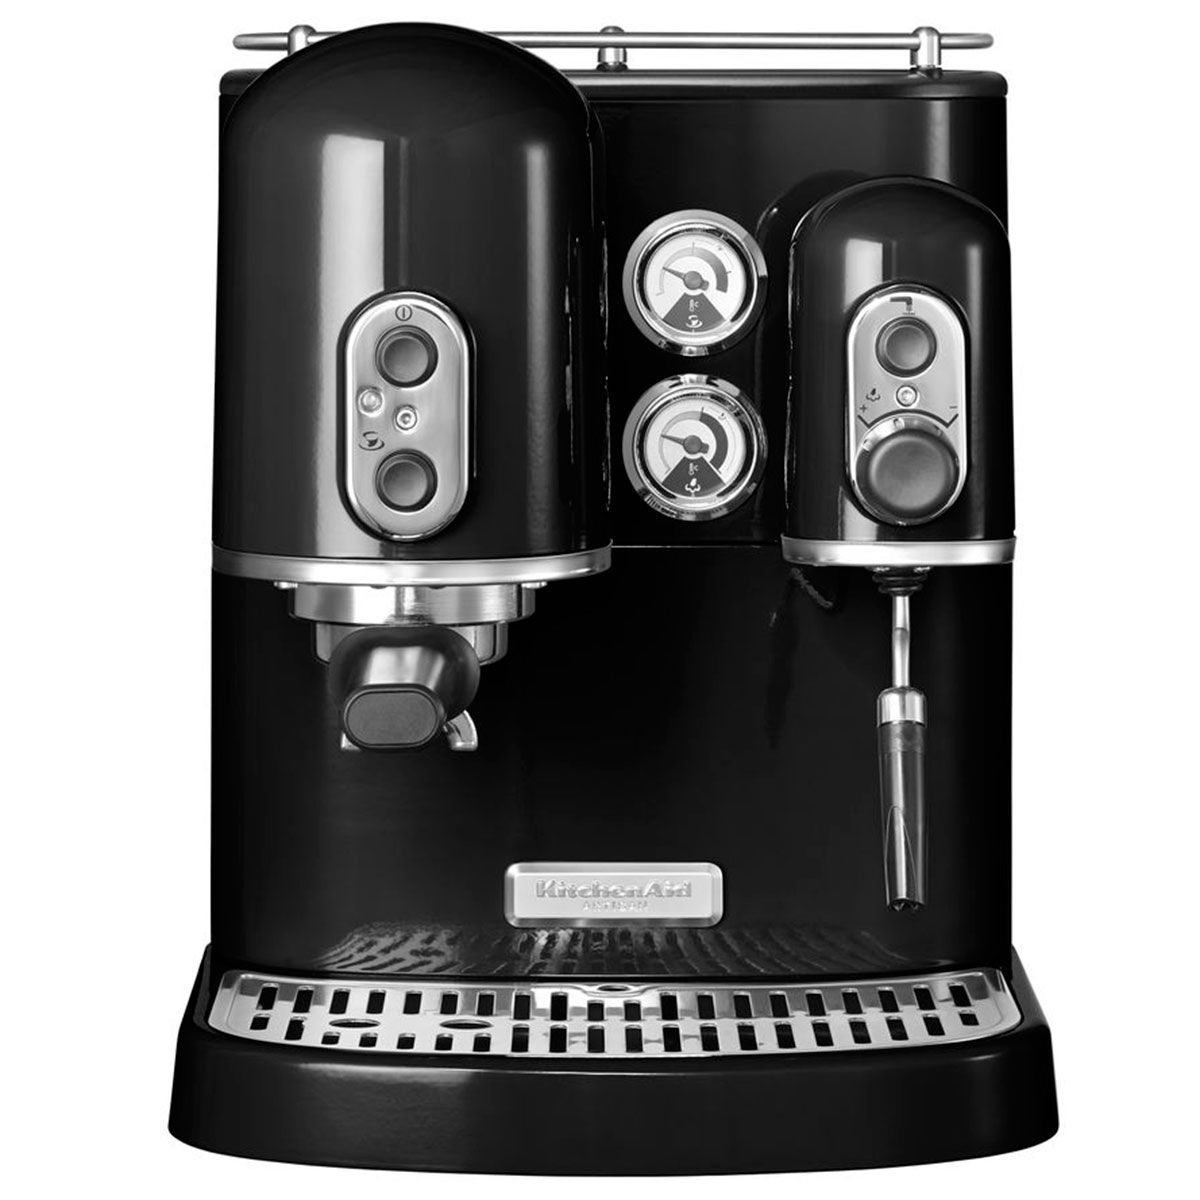 Kitchenaid Artisan 5kes2102 Coffee Machine Review